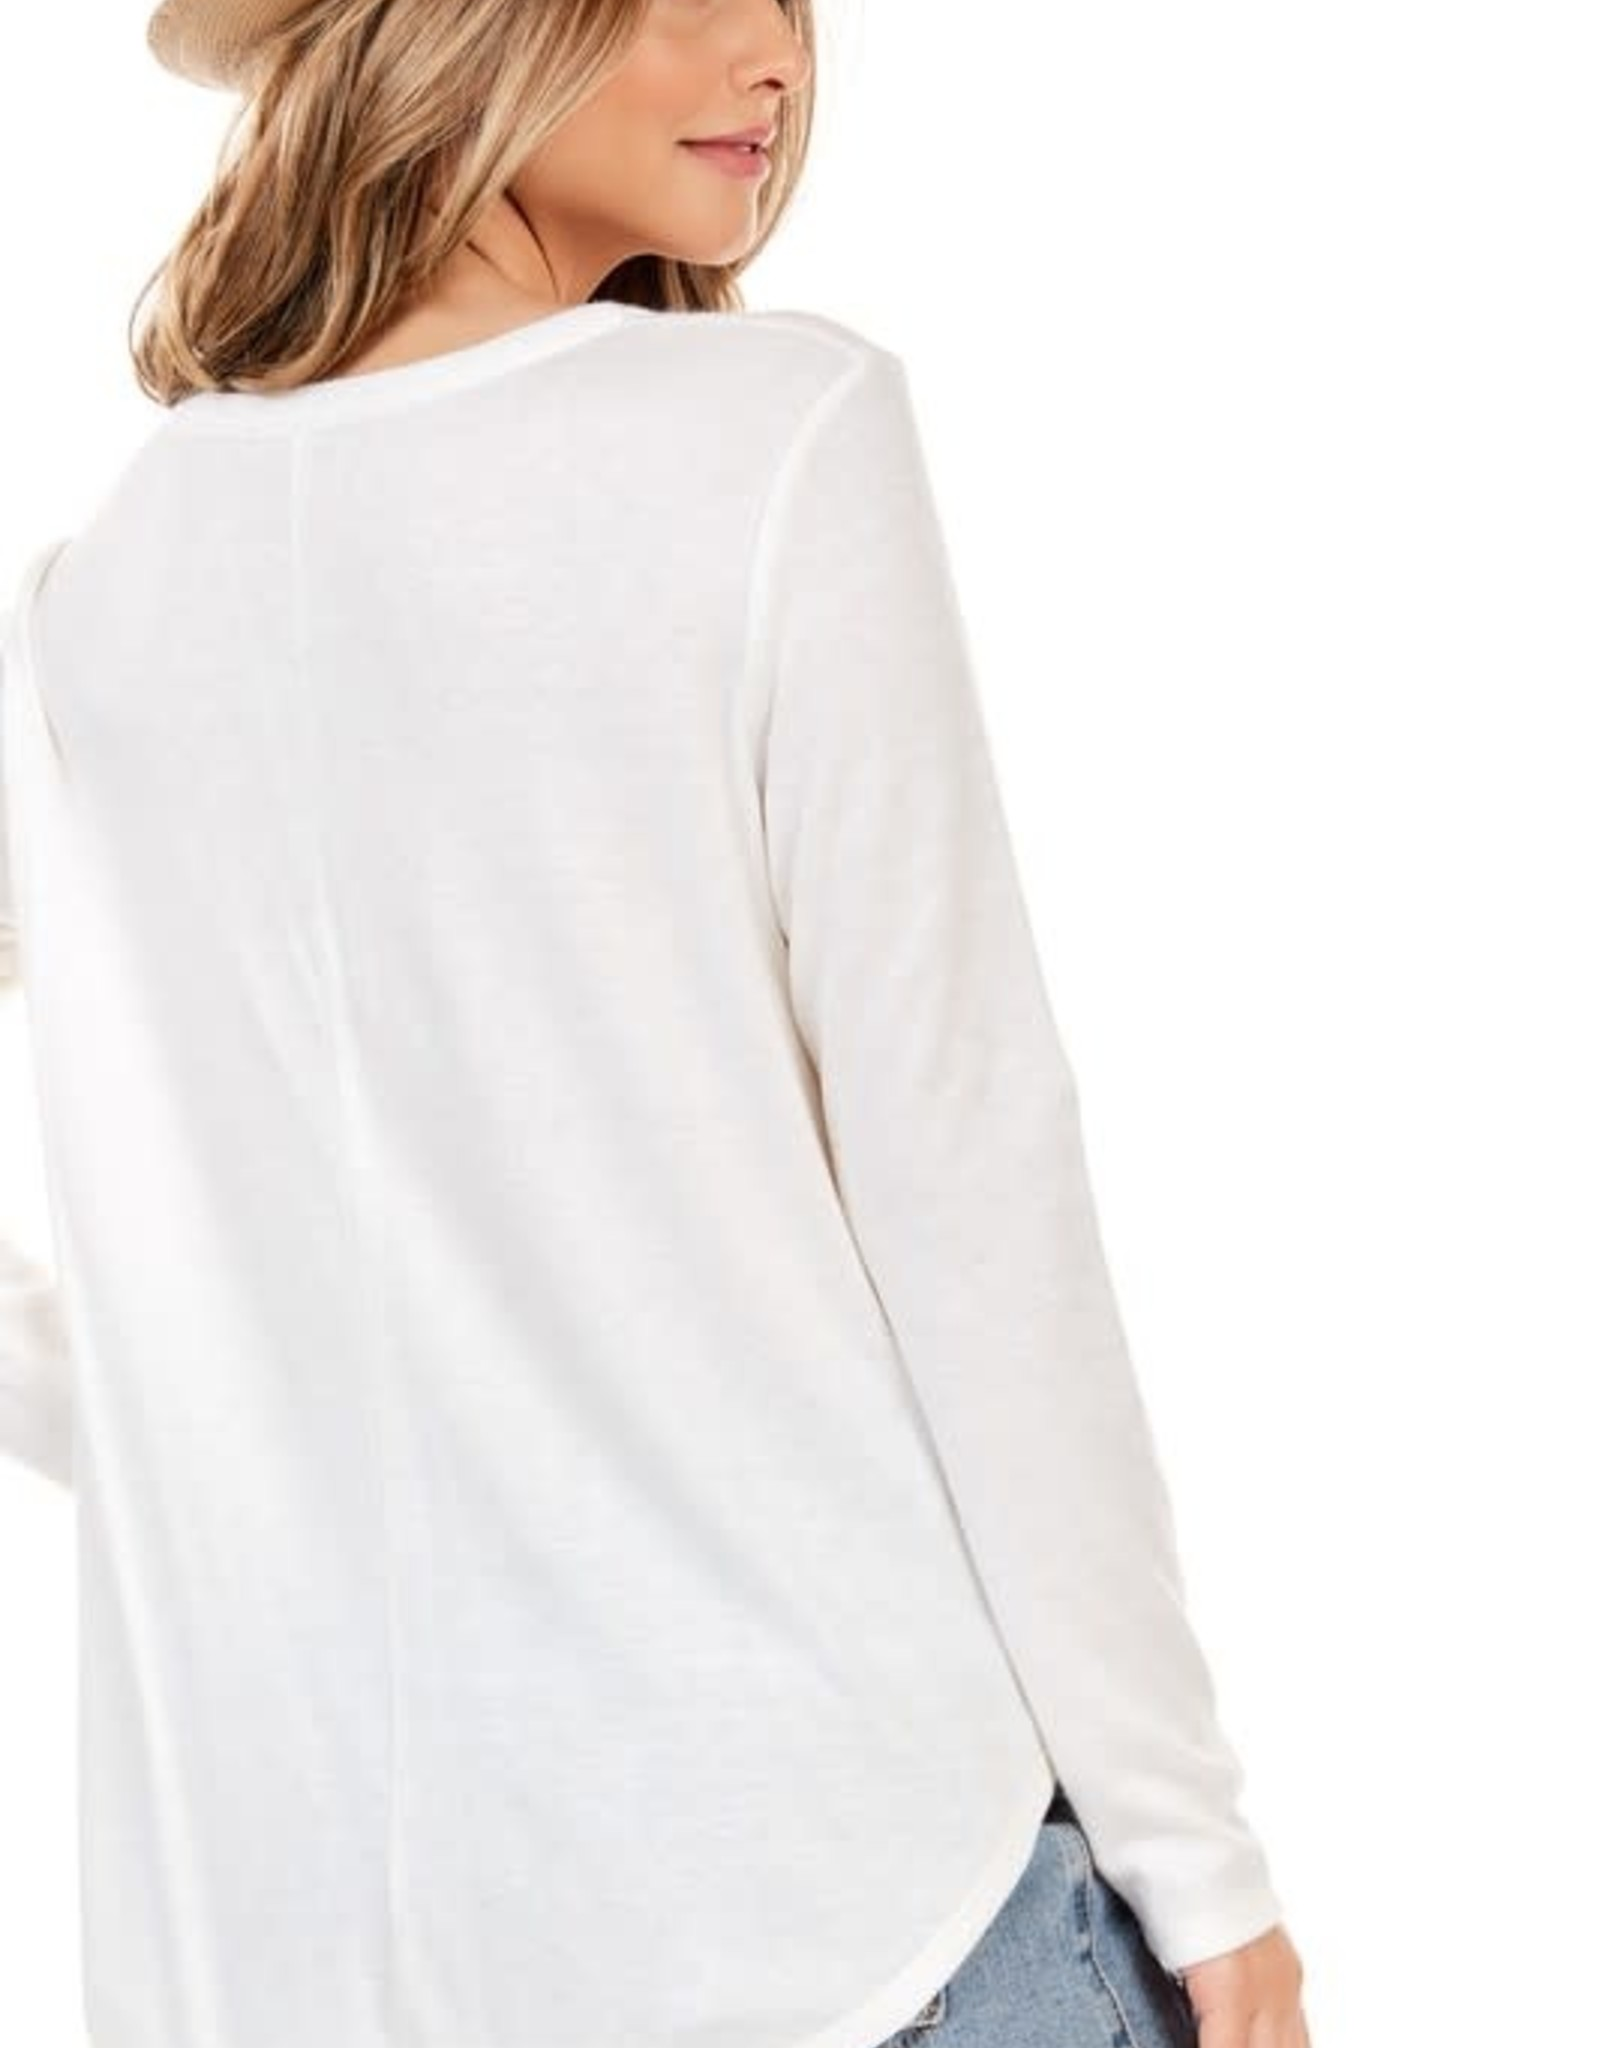 - Off White Cashmere Feel Long Sleeve Top w/Scoop Hem